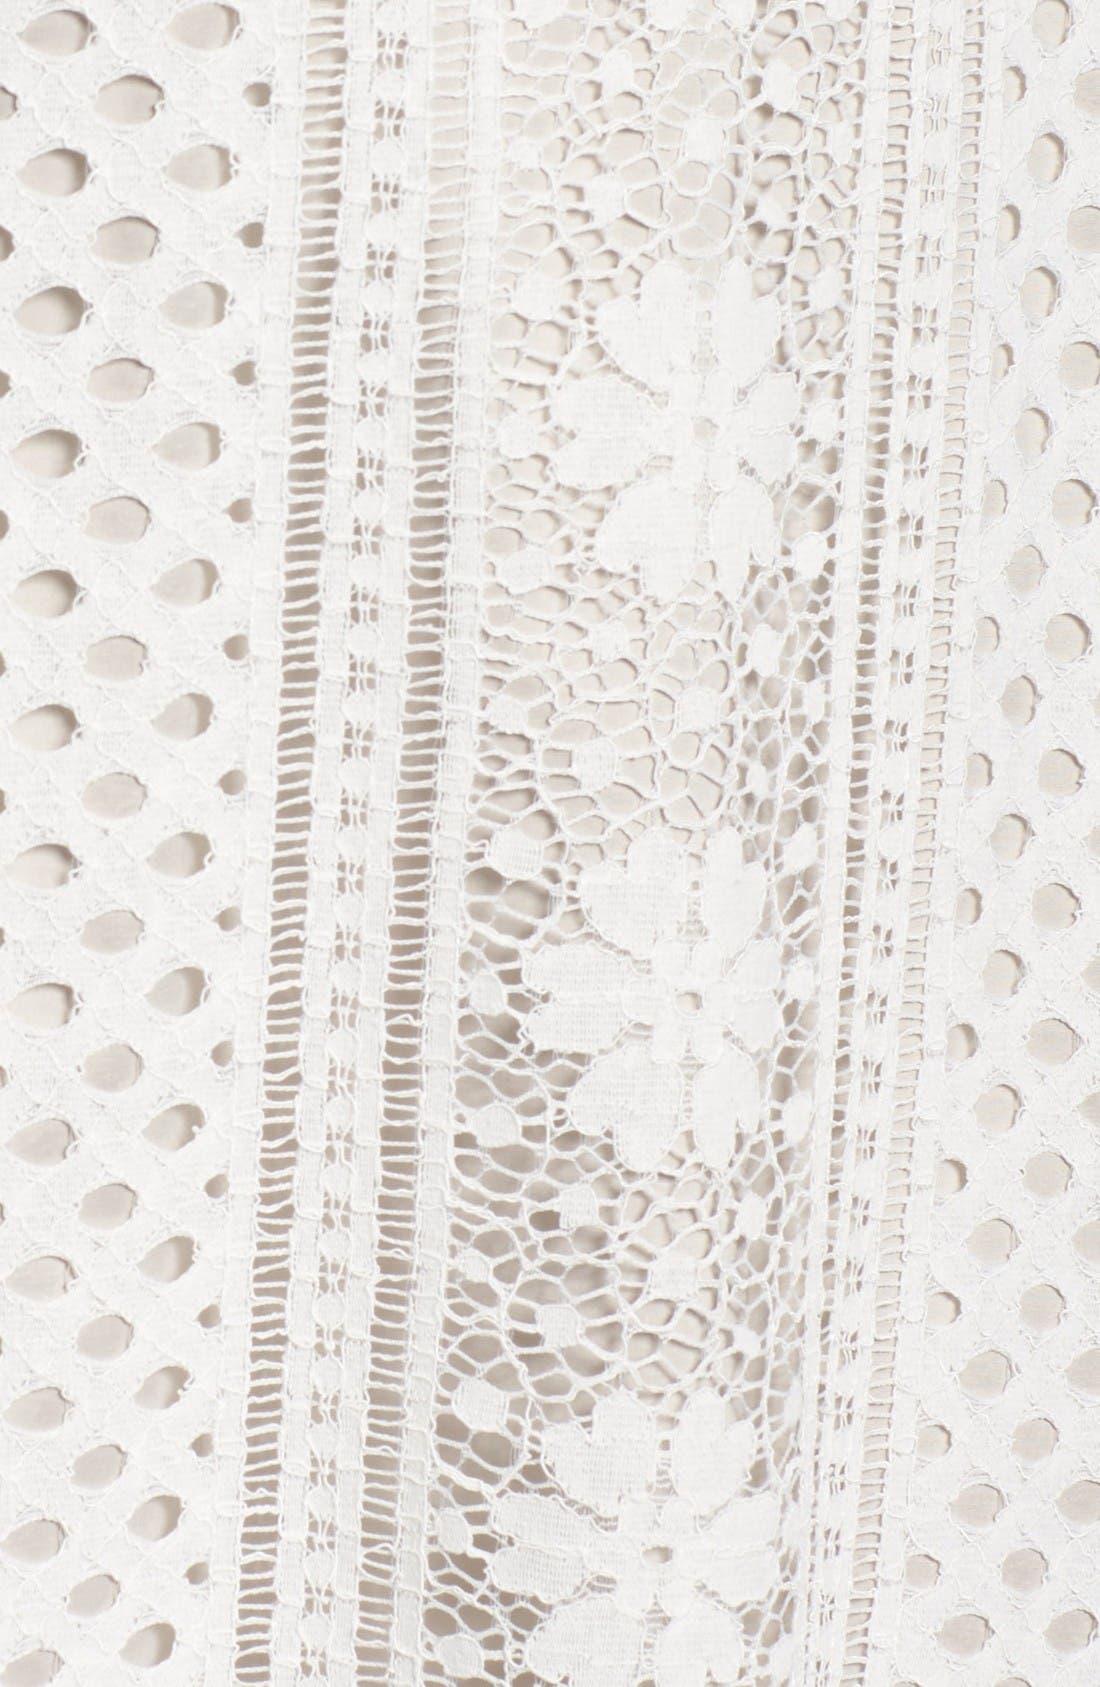 A-Line Lace Dress,                             Alternate thumbnail 5, color,                             Ivory/Chamois